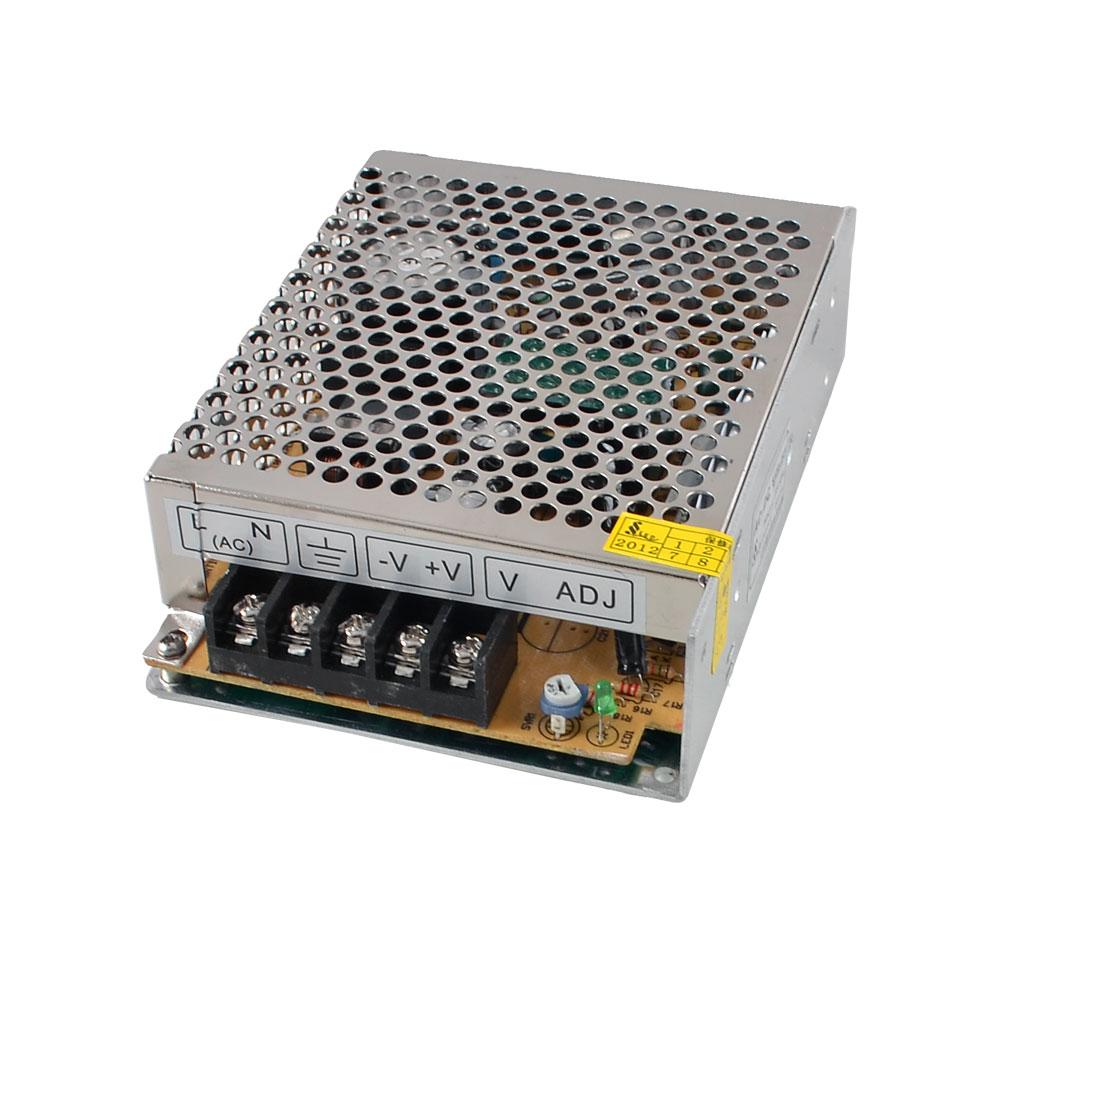 120W DC 24V 5A Switching Power Supply Converter for LED Strip Light AC 220V 50Hz